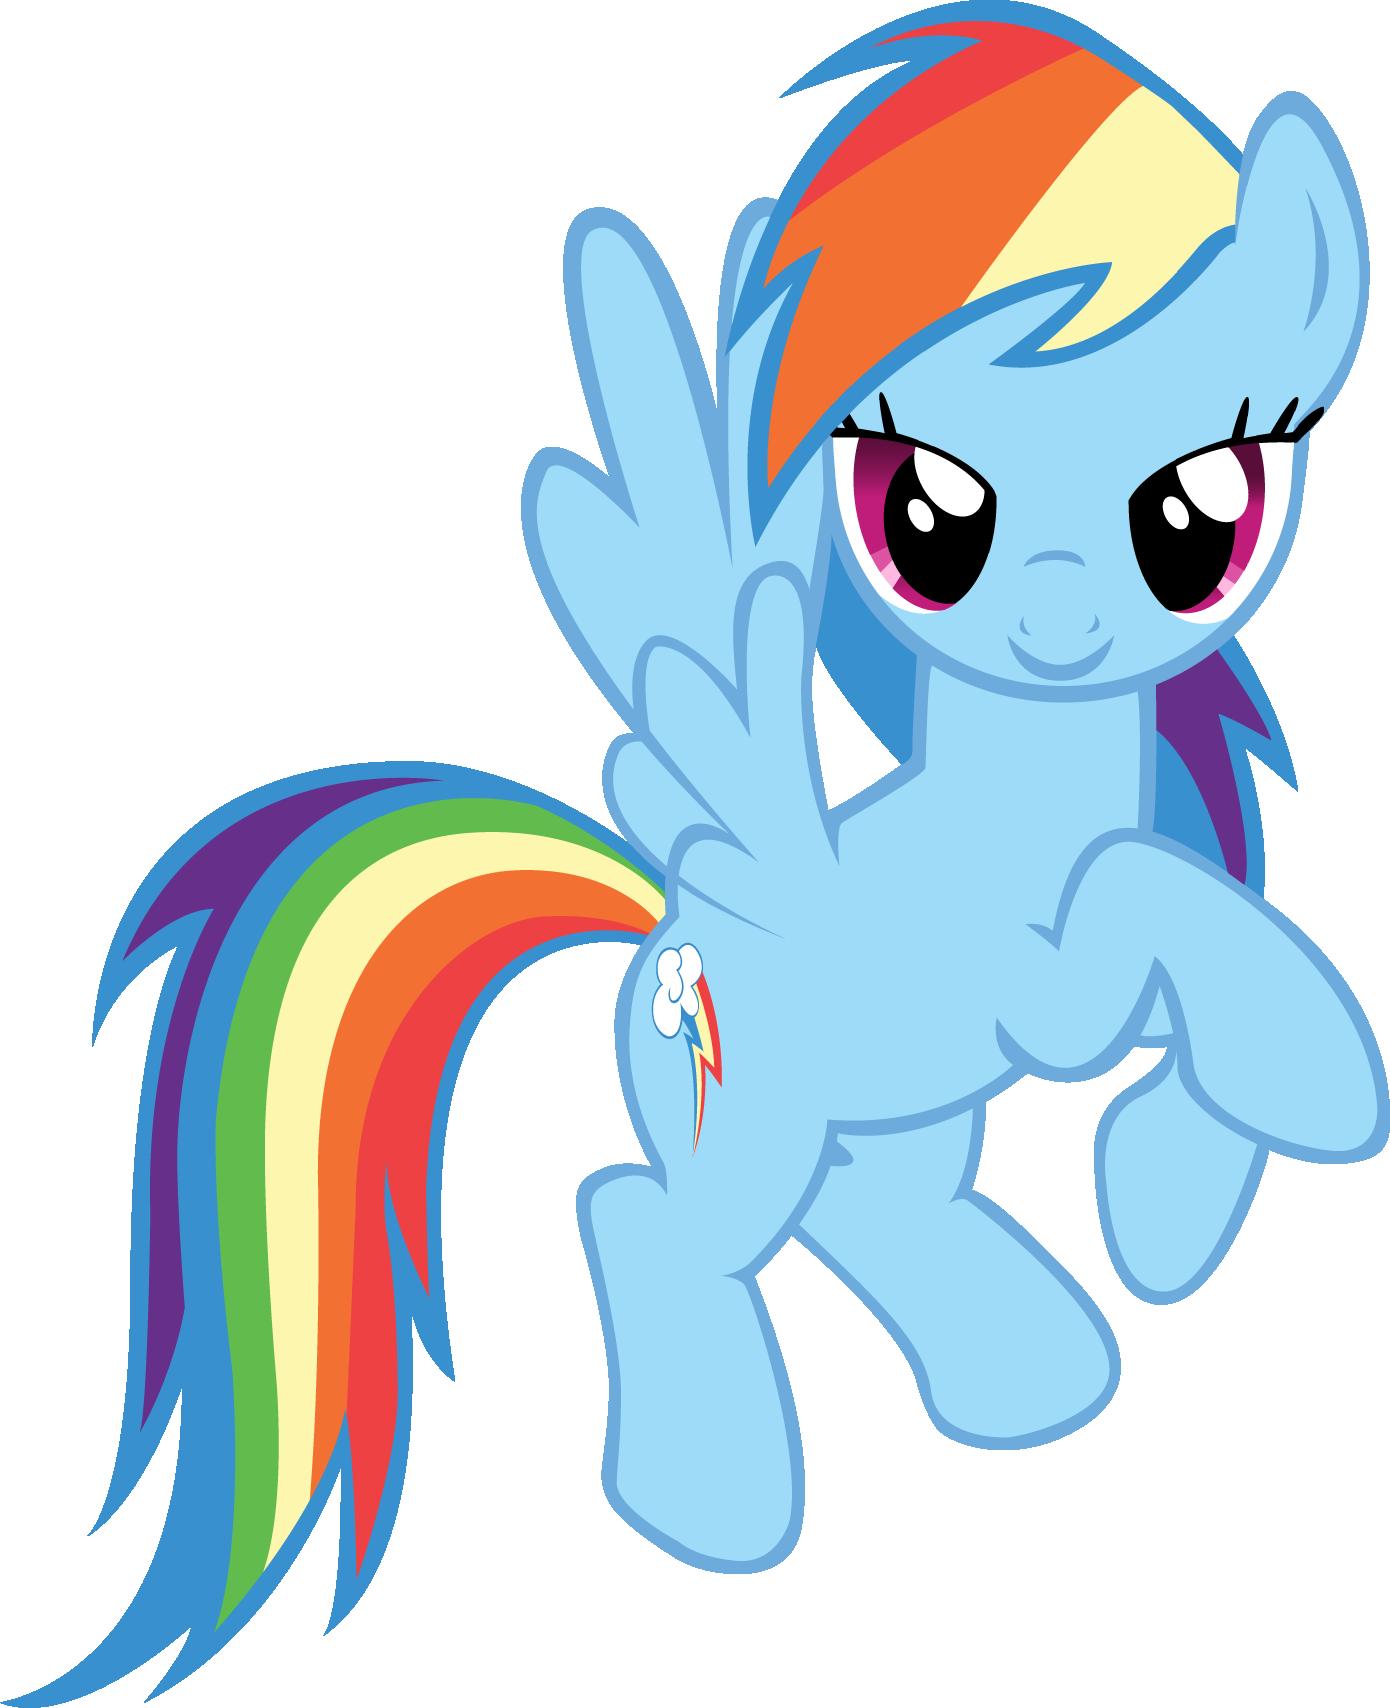 Rainbow Dash Png Image - My litt...